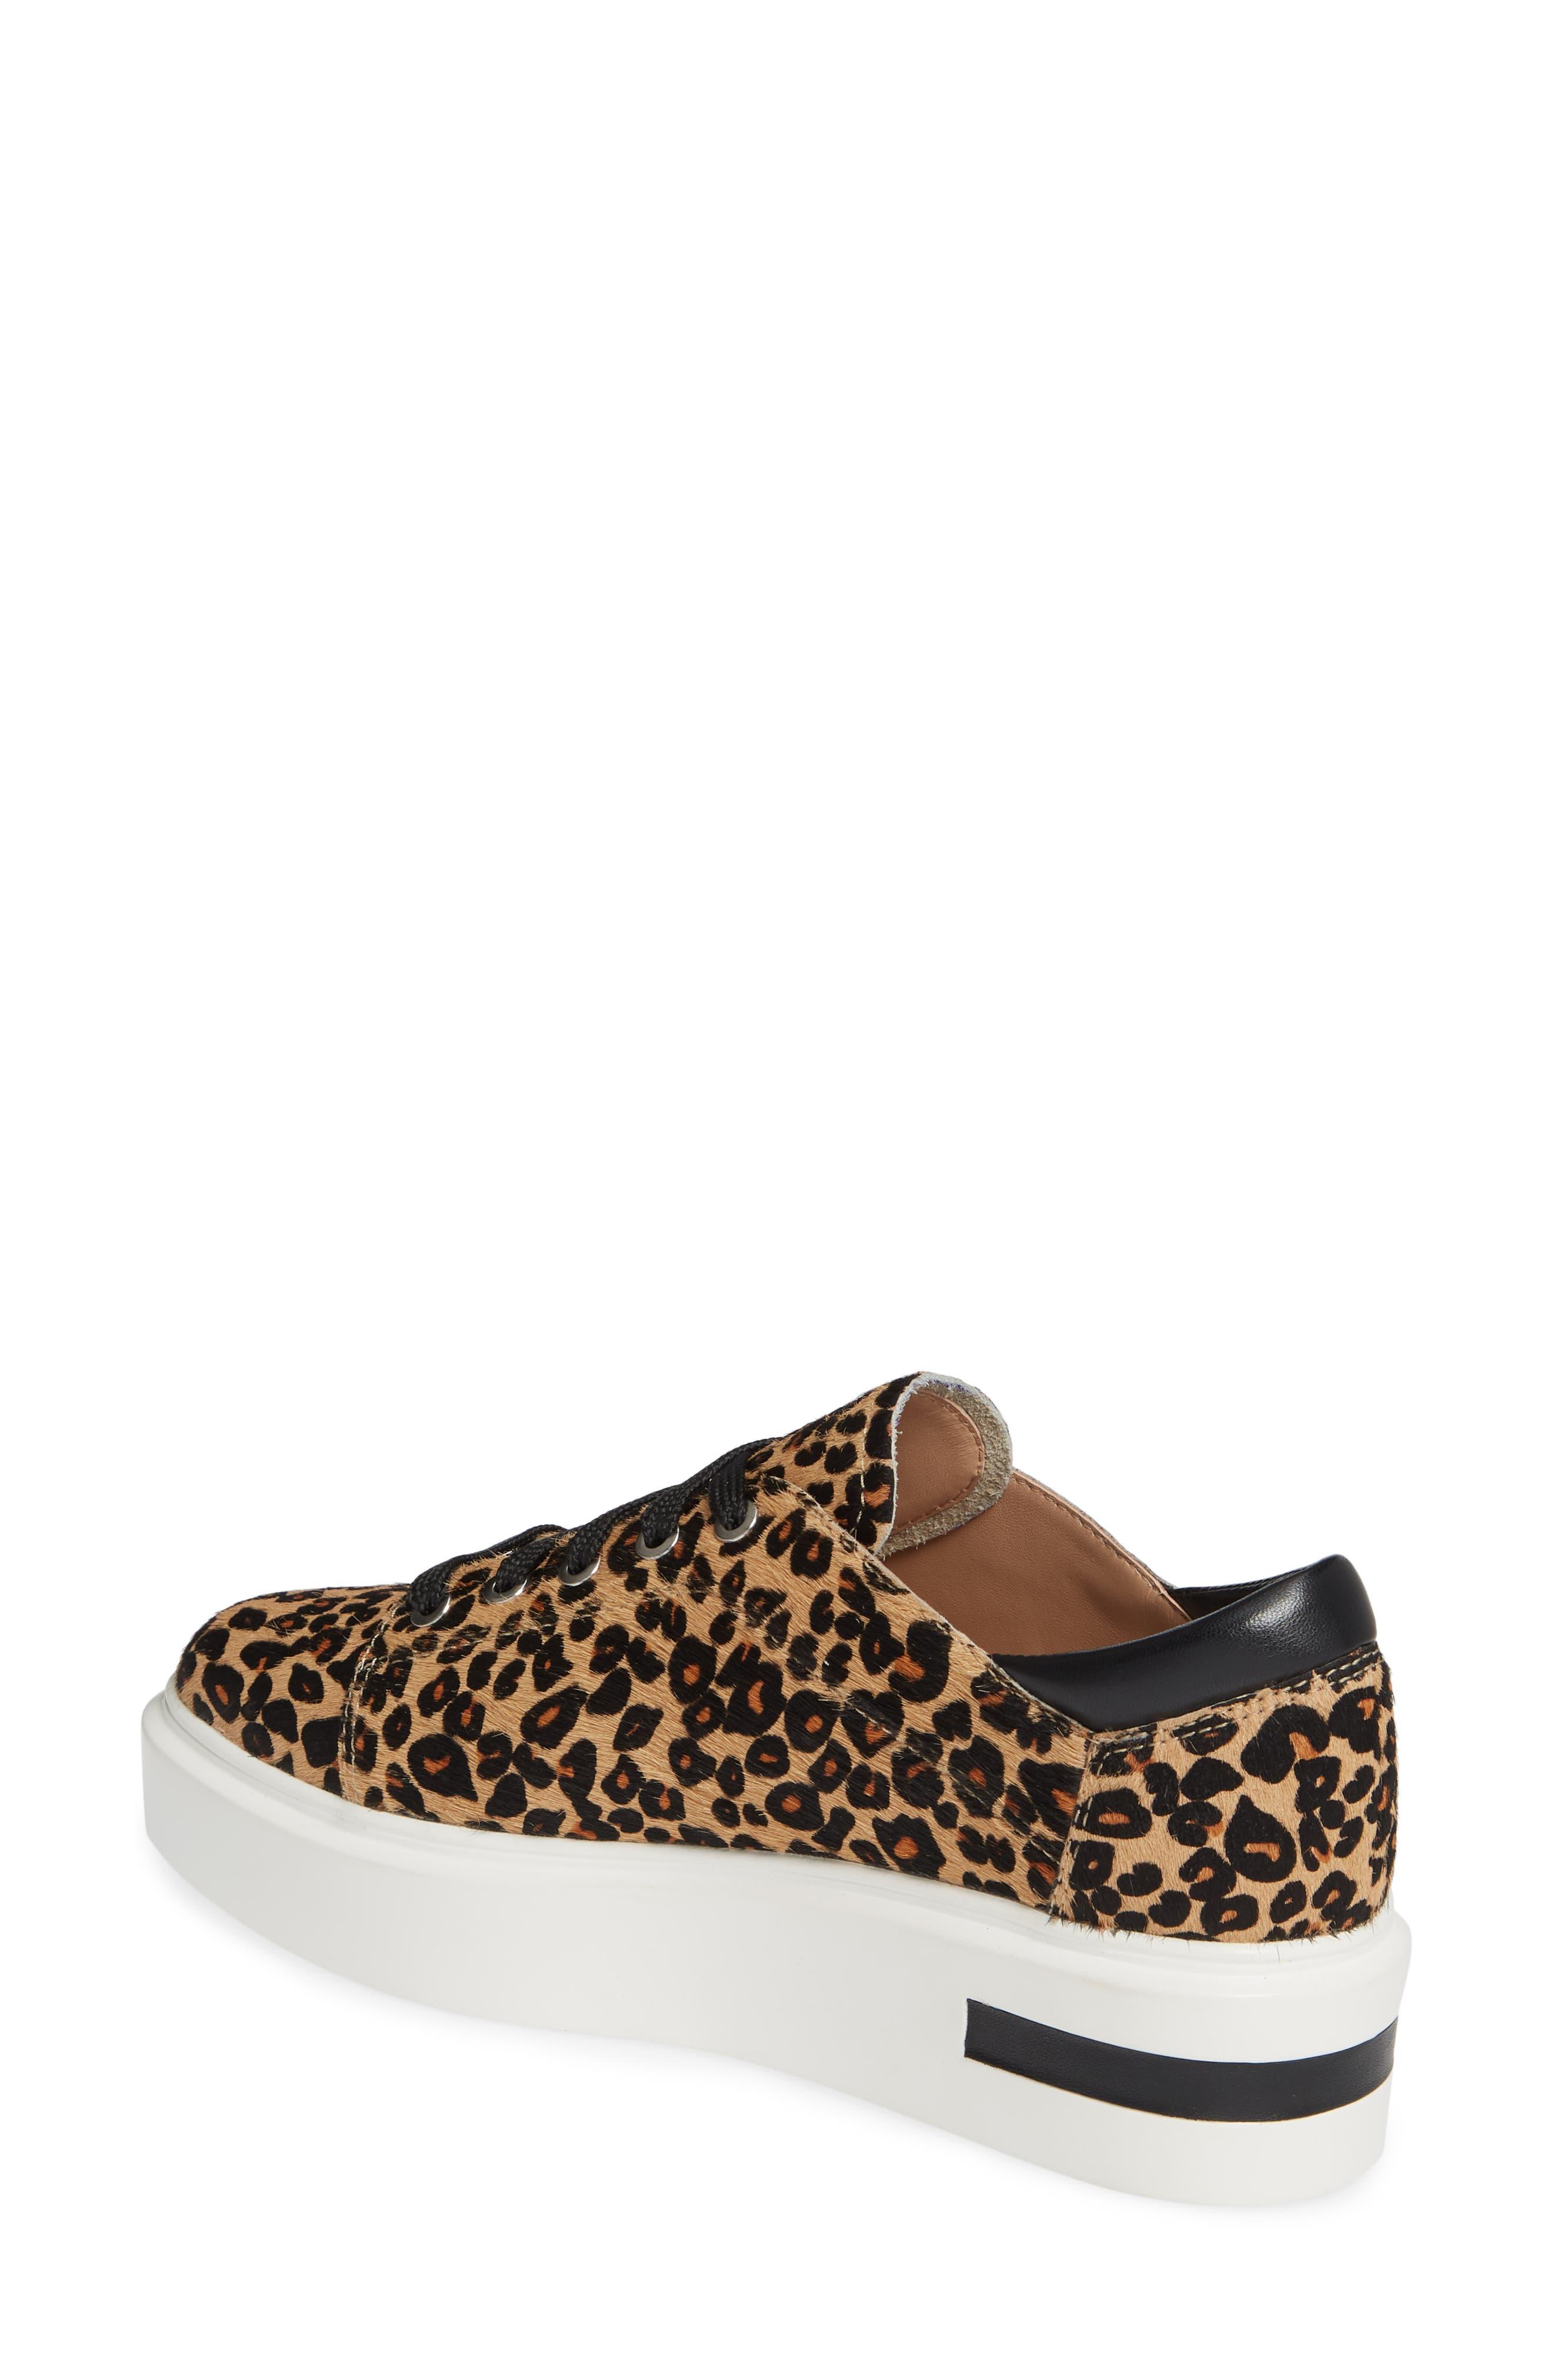 LINEA PAOLO, Kendra Genuine Calf Hair Platform Sneaker, Alternate thumbnail 2, color, LEOPARD PRINT CALF HAIR